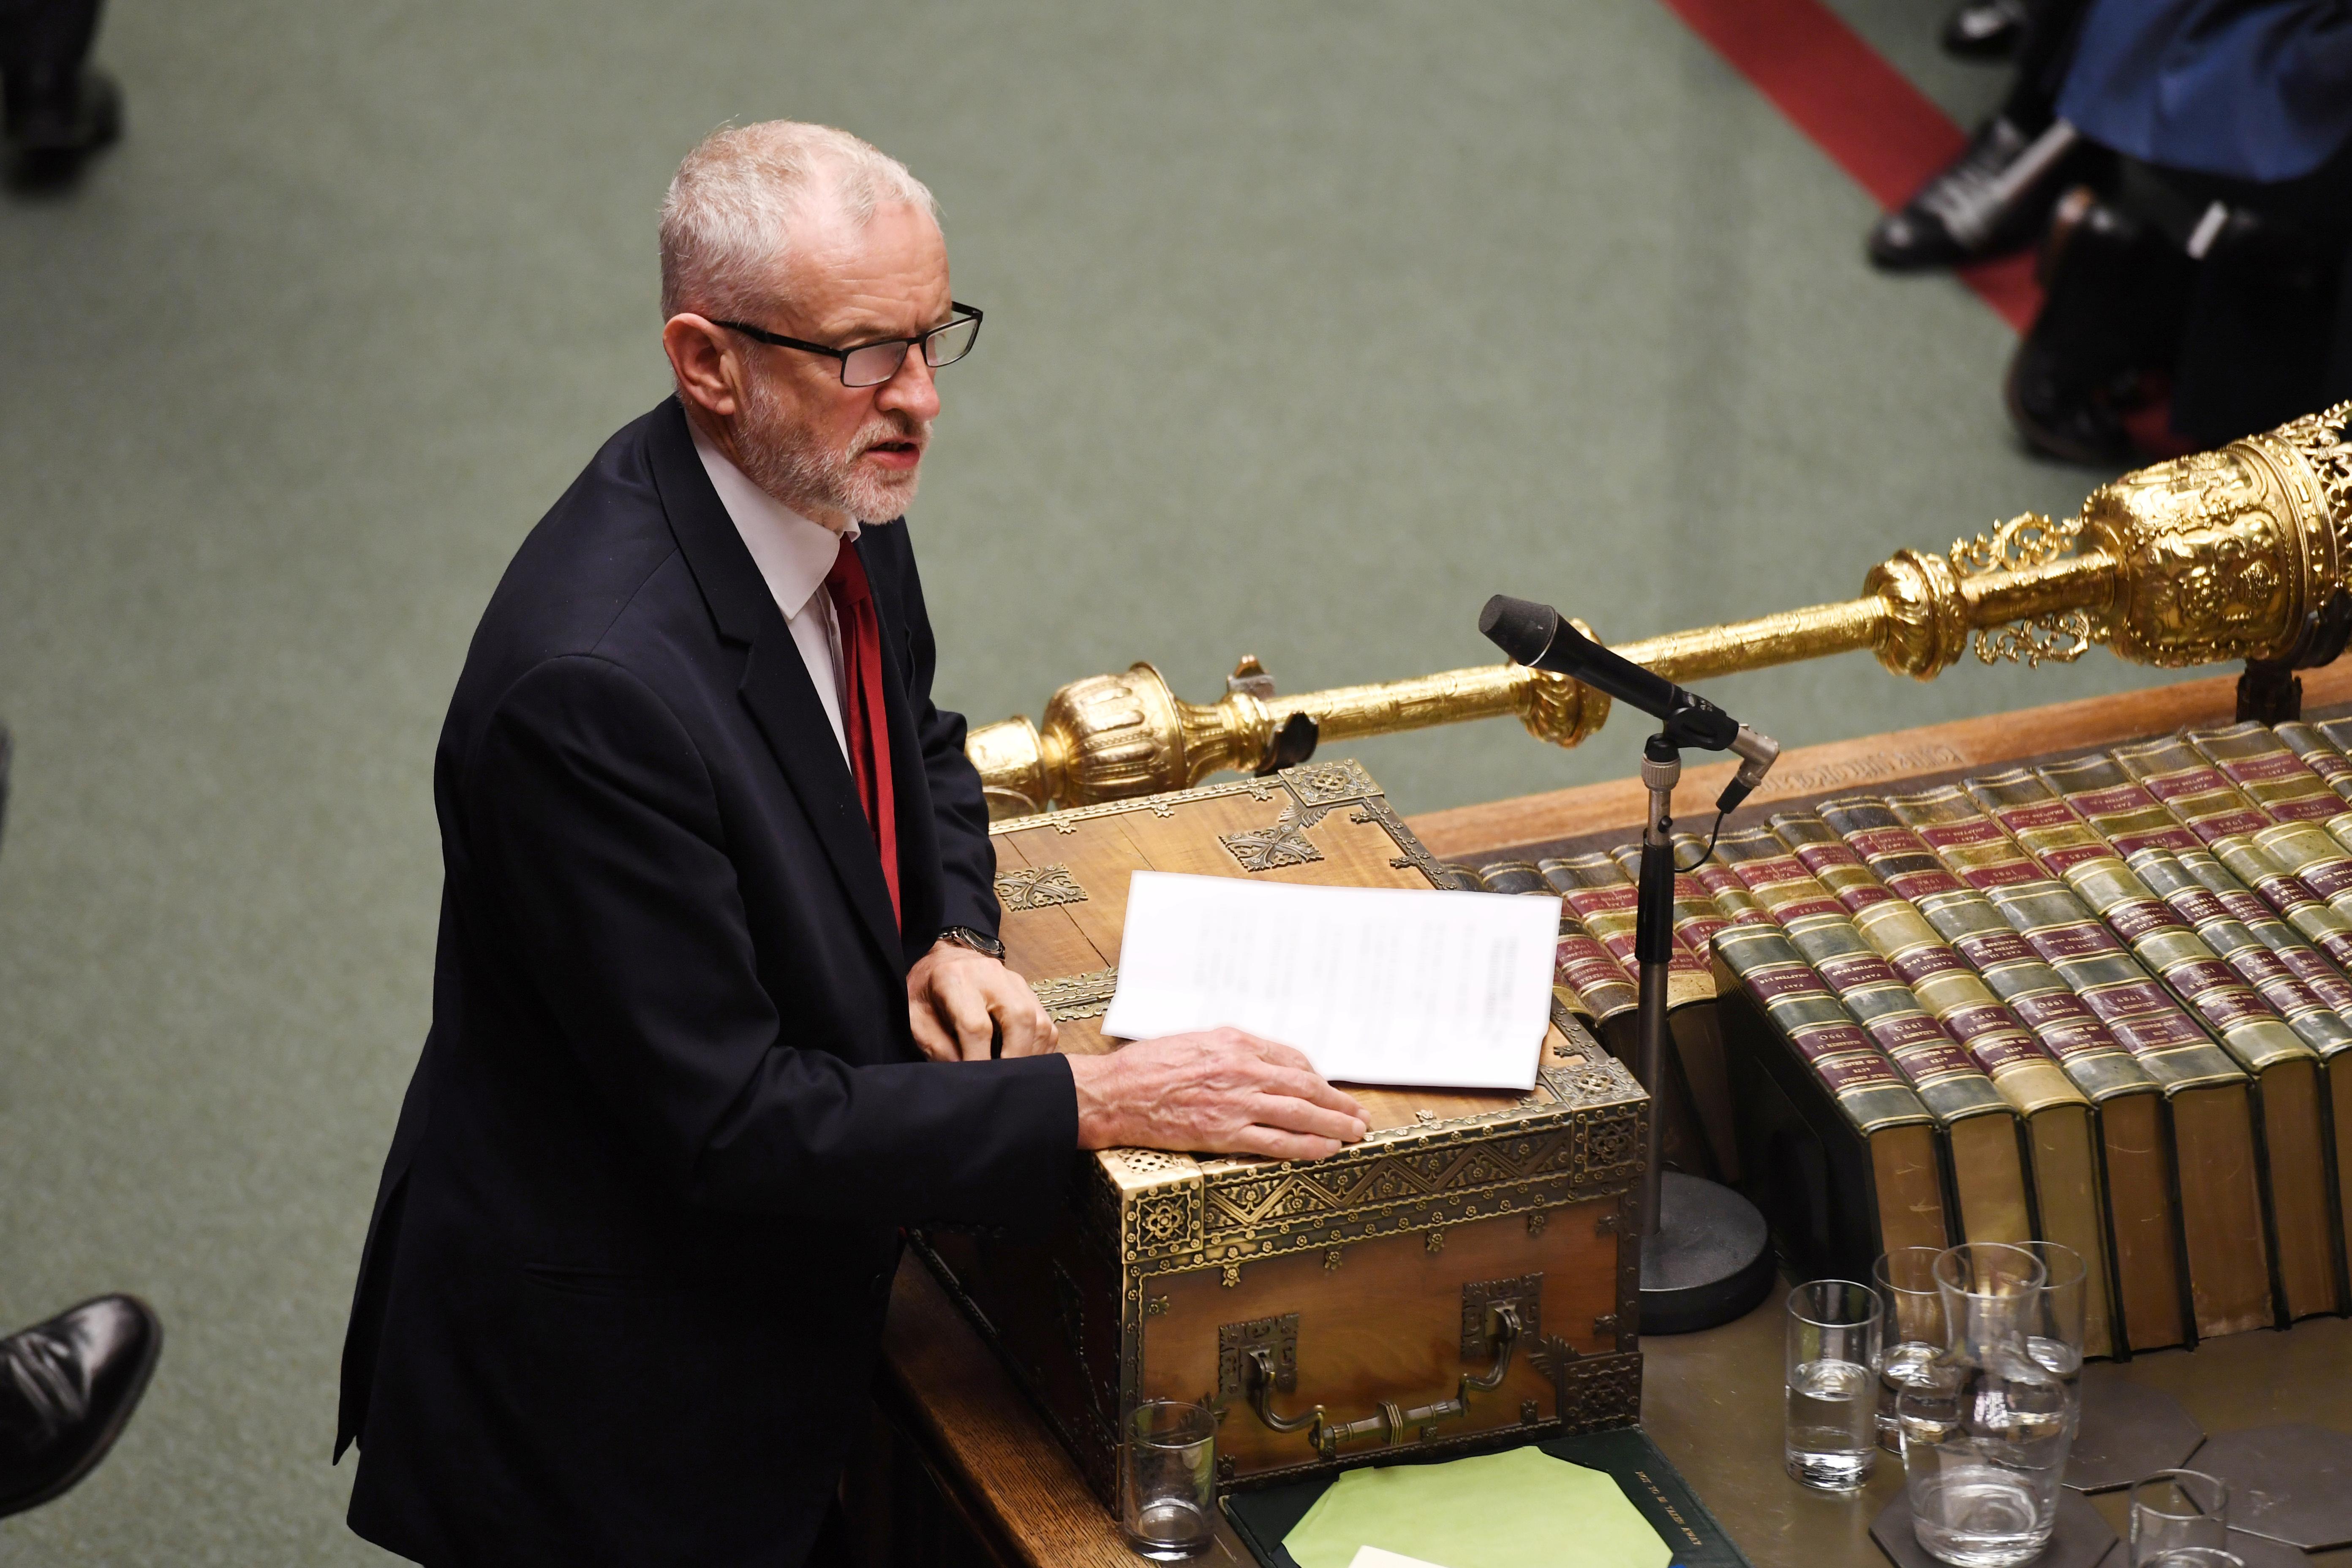 Britain's Corbyn meets PM Johnson to discuss Brexit timetable: Labour source